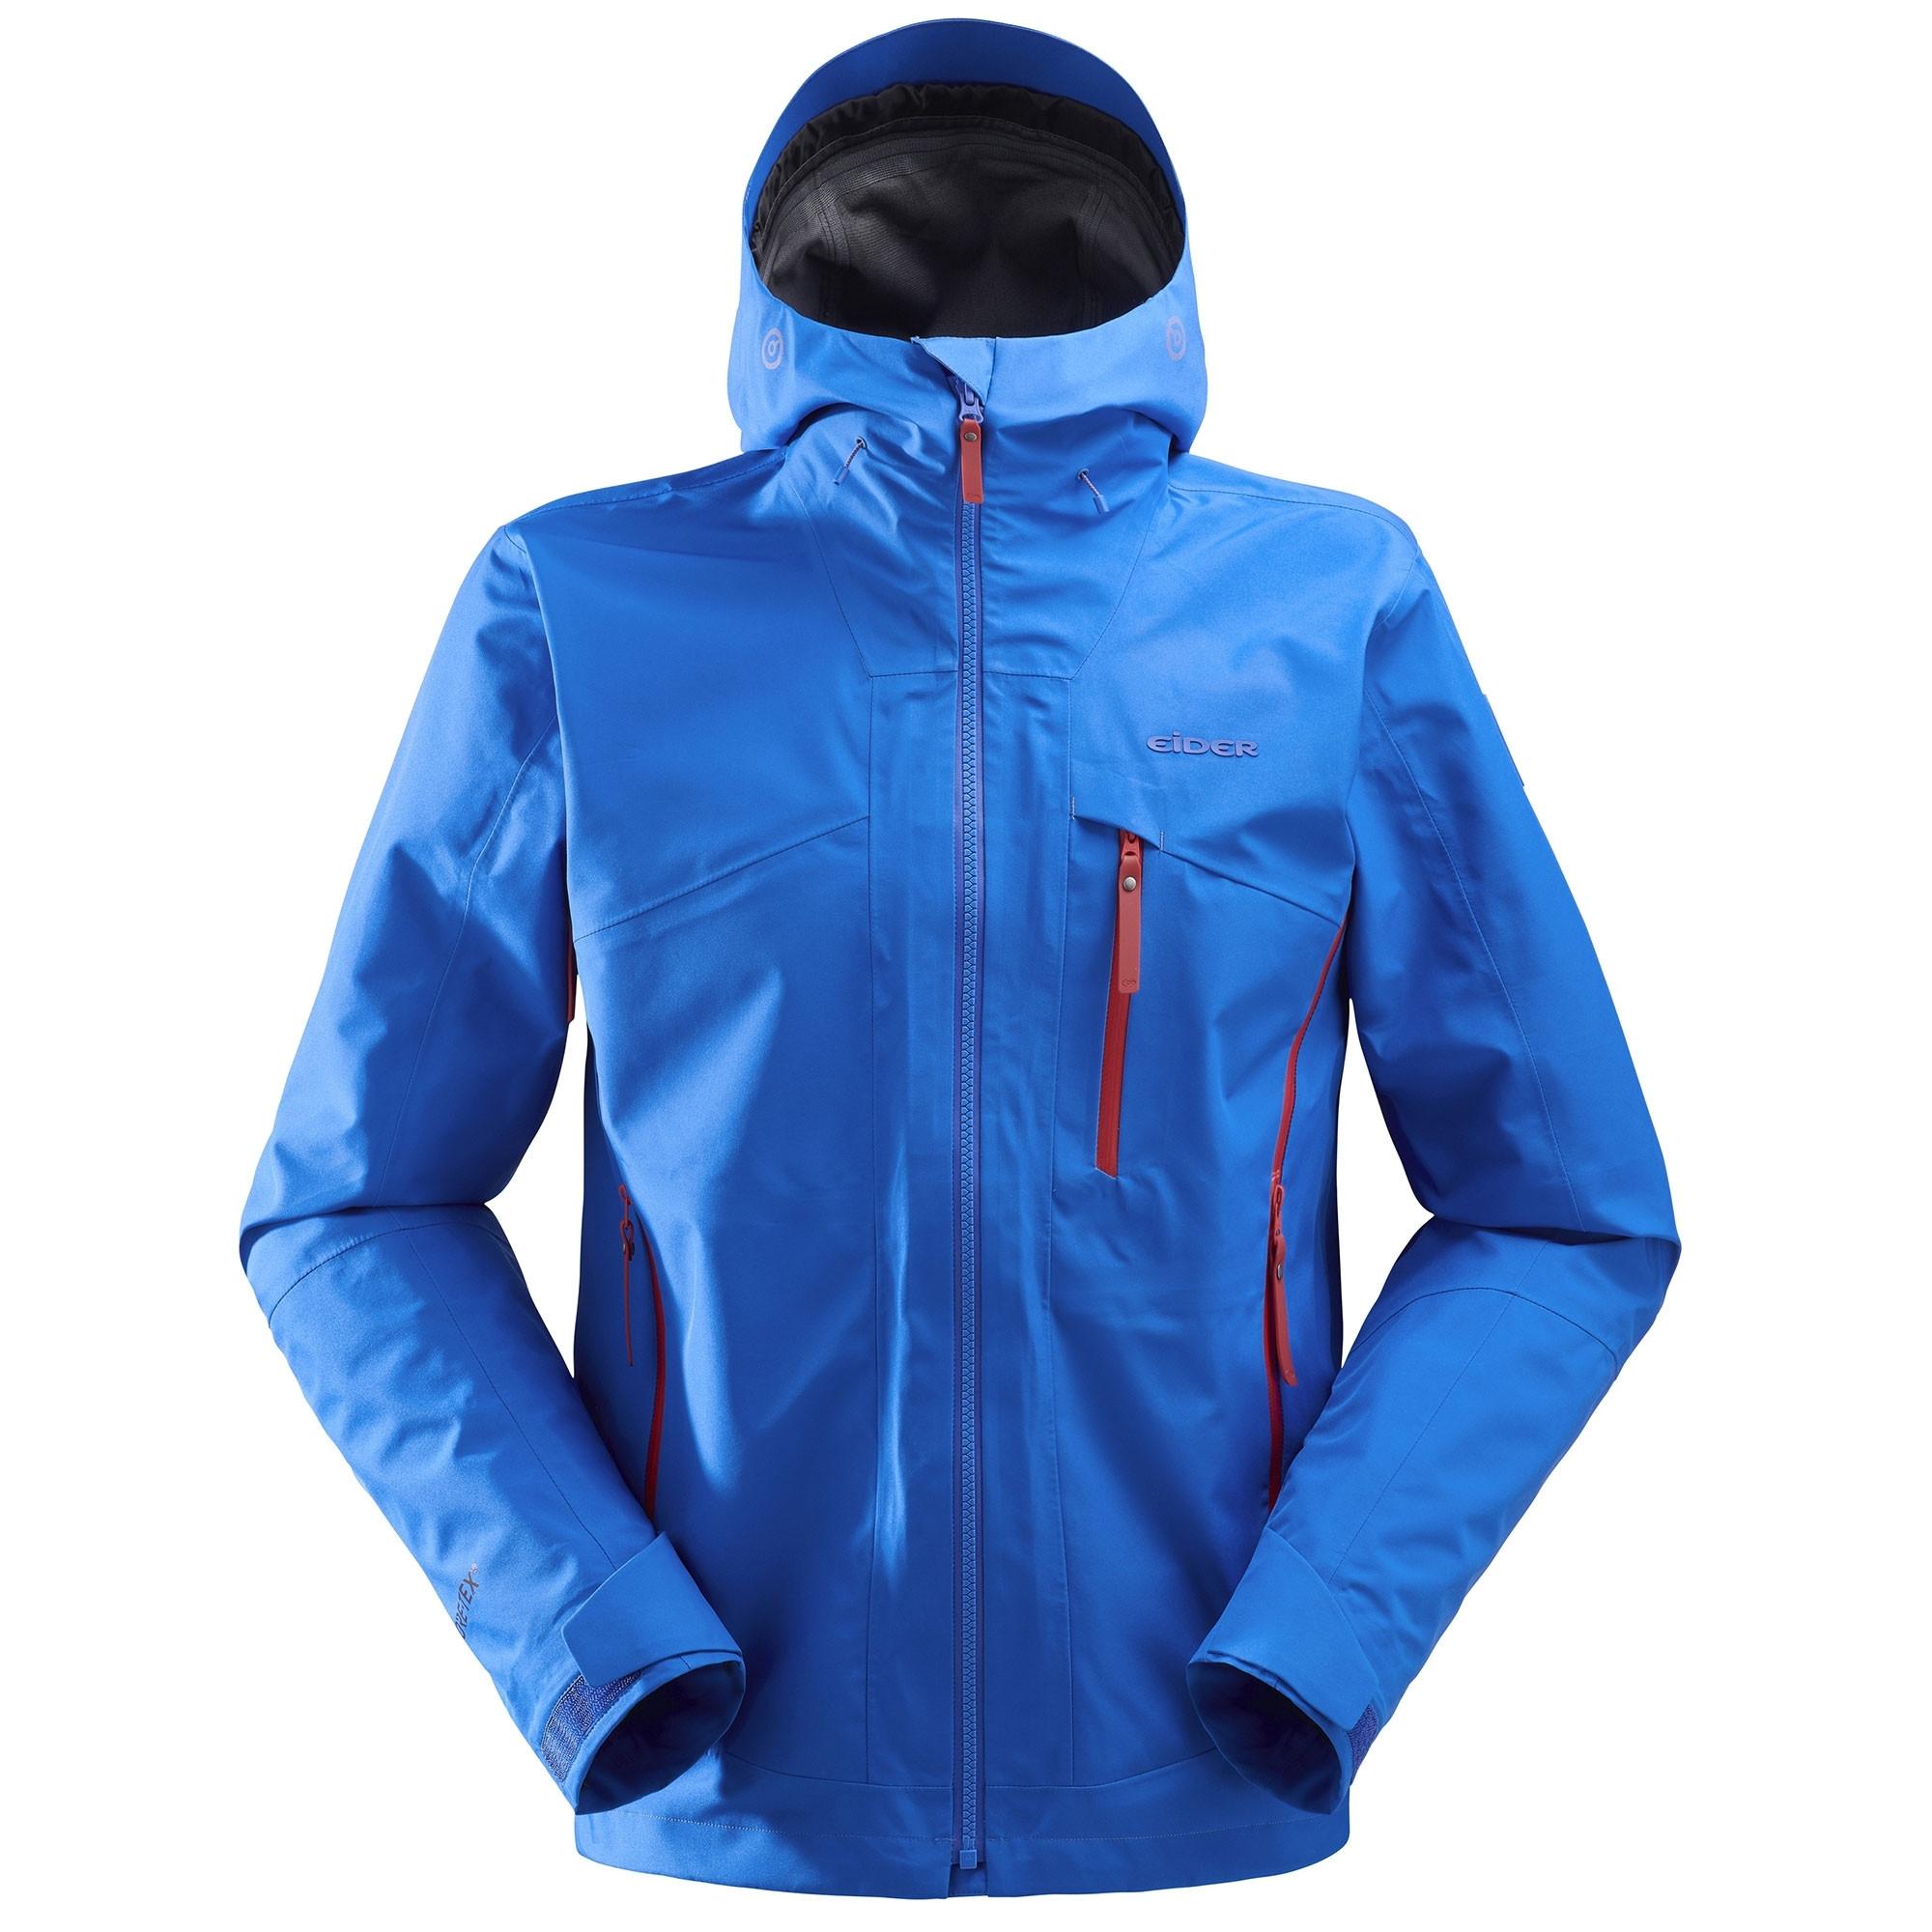 Conception innovante 1a25c 6ae5d Veste De Ski Gore-tex Eider Ramble 3l Bleu Homme